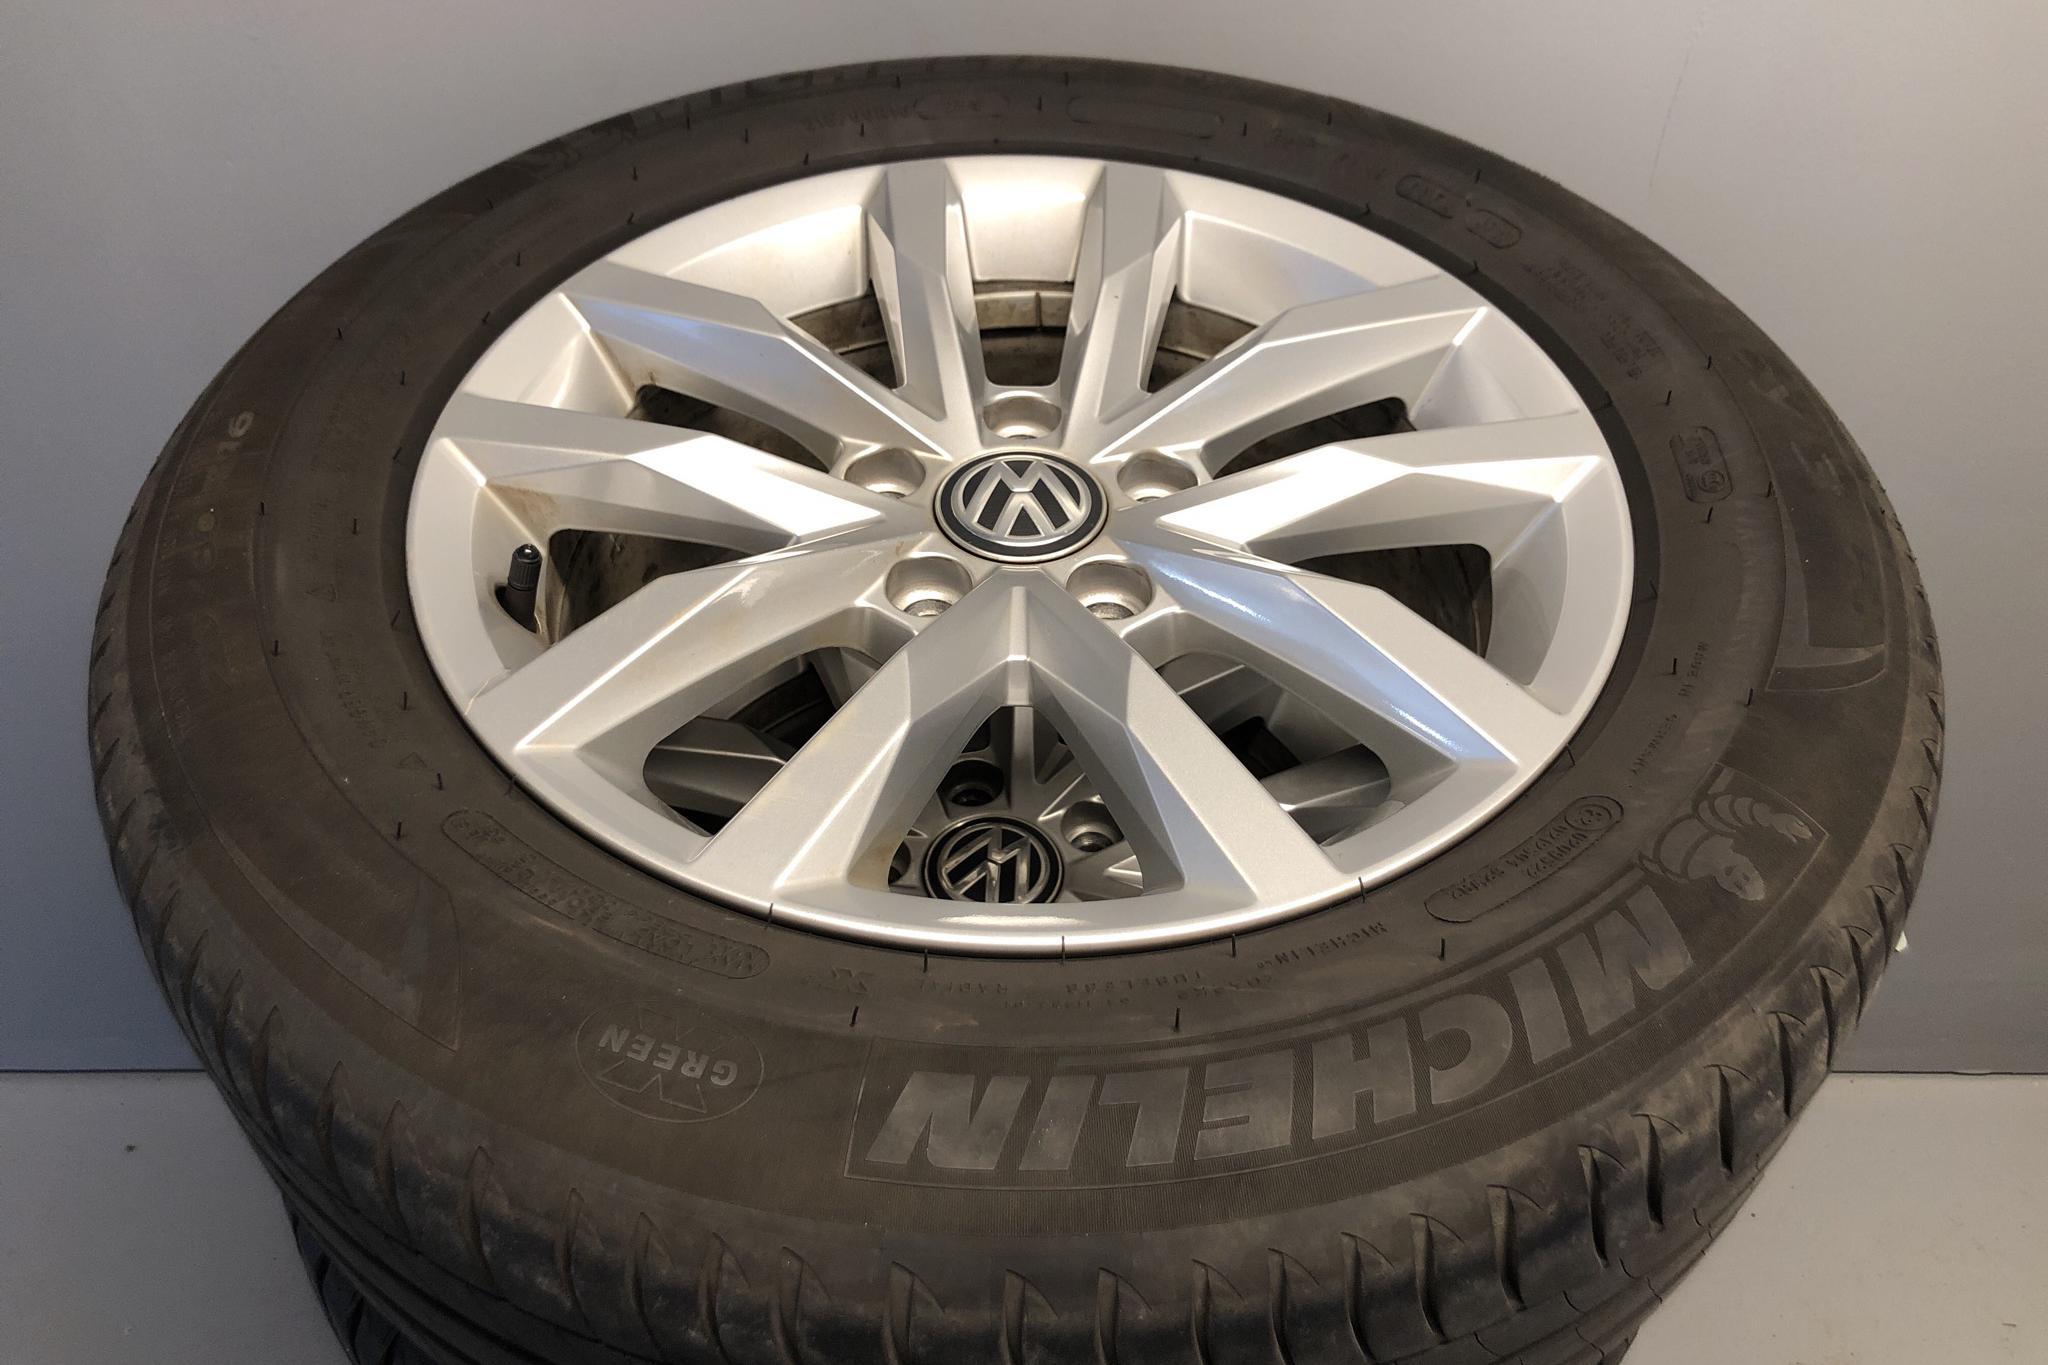 VW Passat 1.4 TSI Sportscombi (150hk) - 5 378 mil - Manuell - vit - 2018